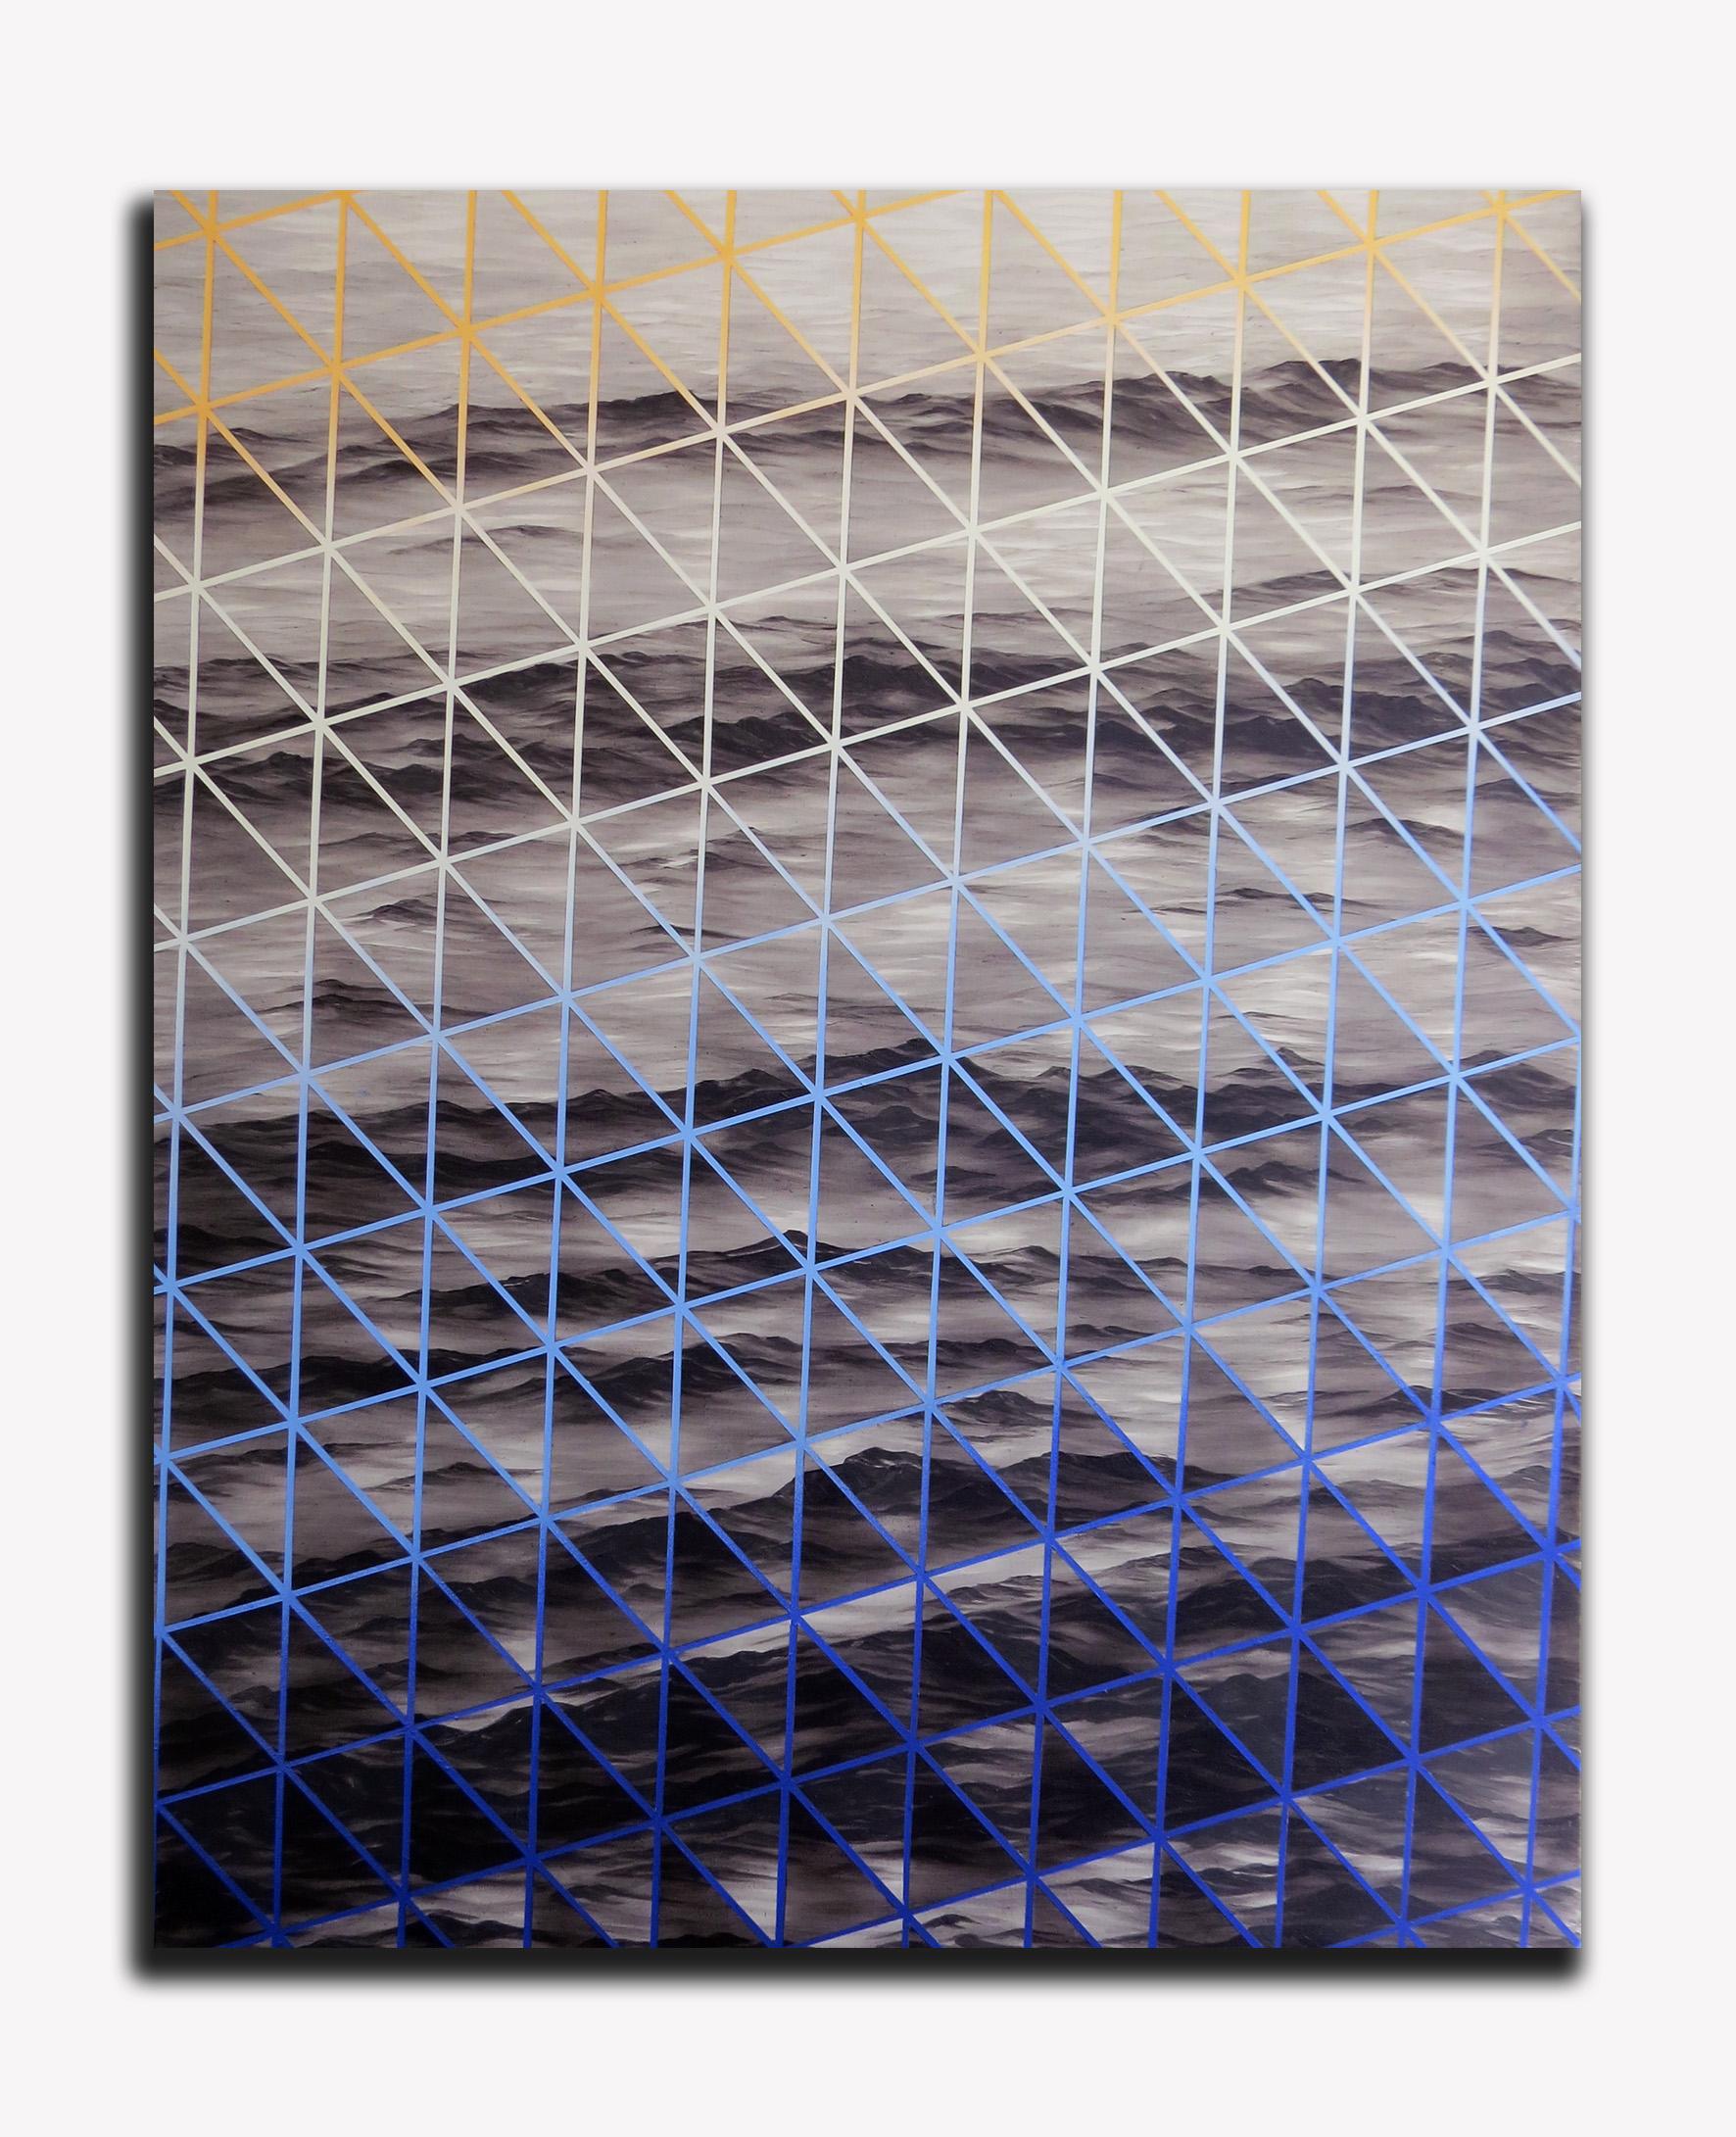 3. Fight the dying of the light #3, 137 x 167cm, Acrylic, Matt and Gloss on cnvas 2016.jpg